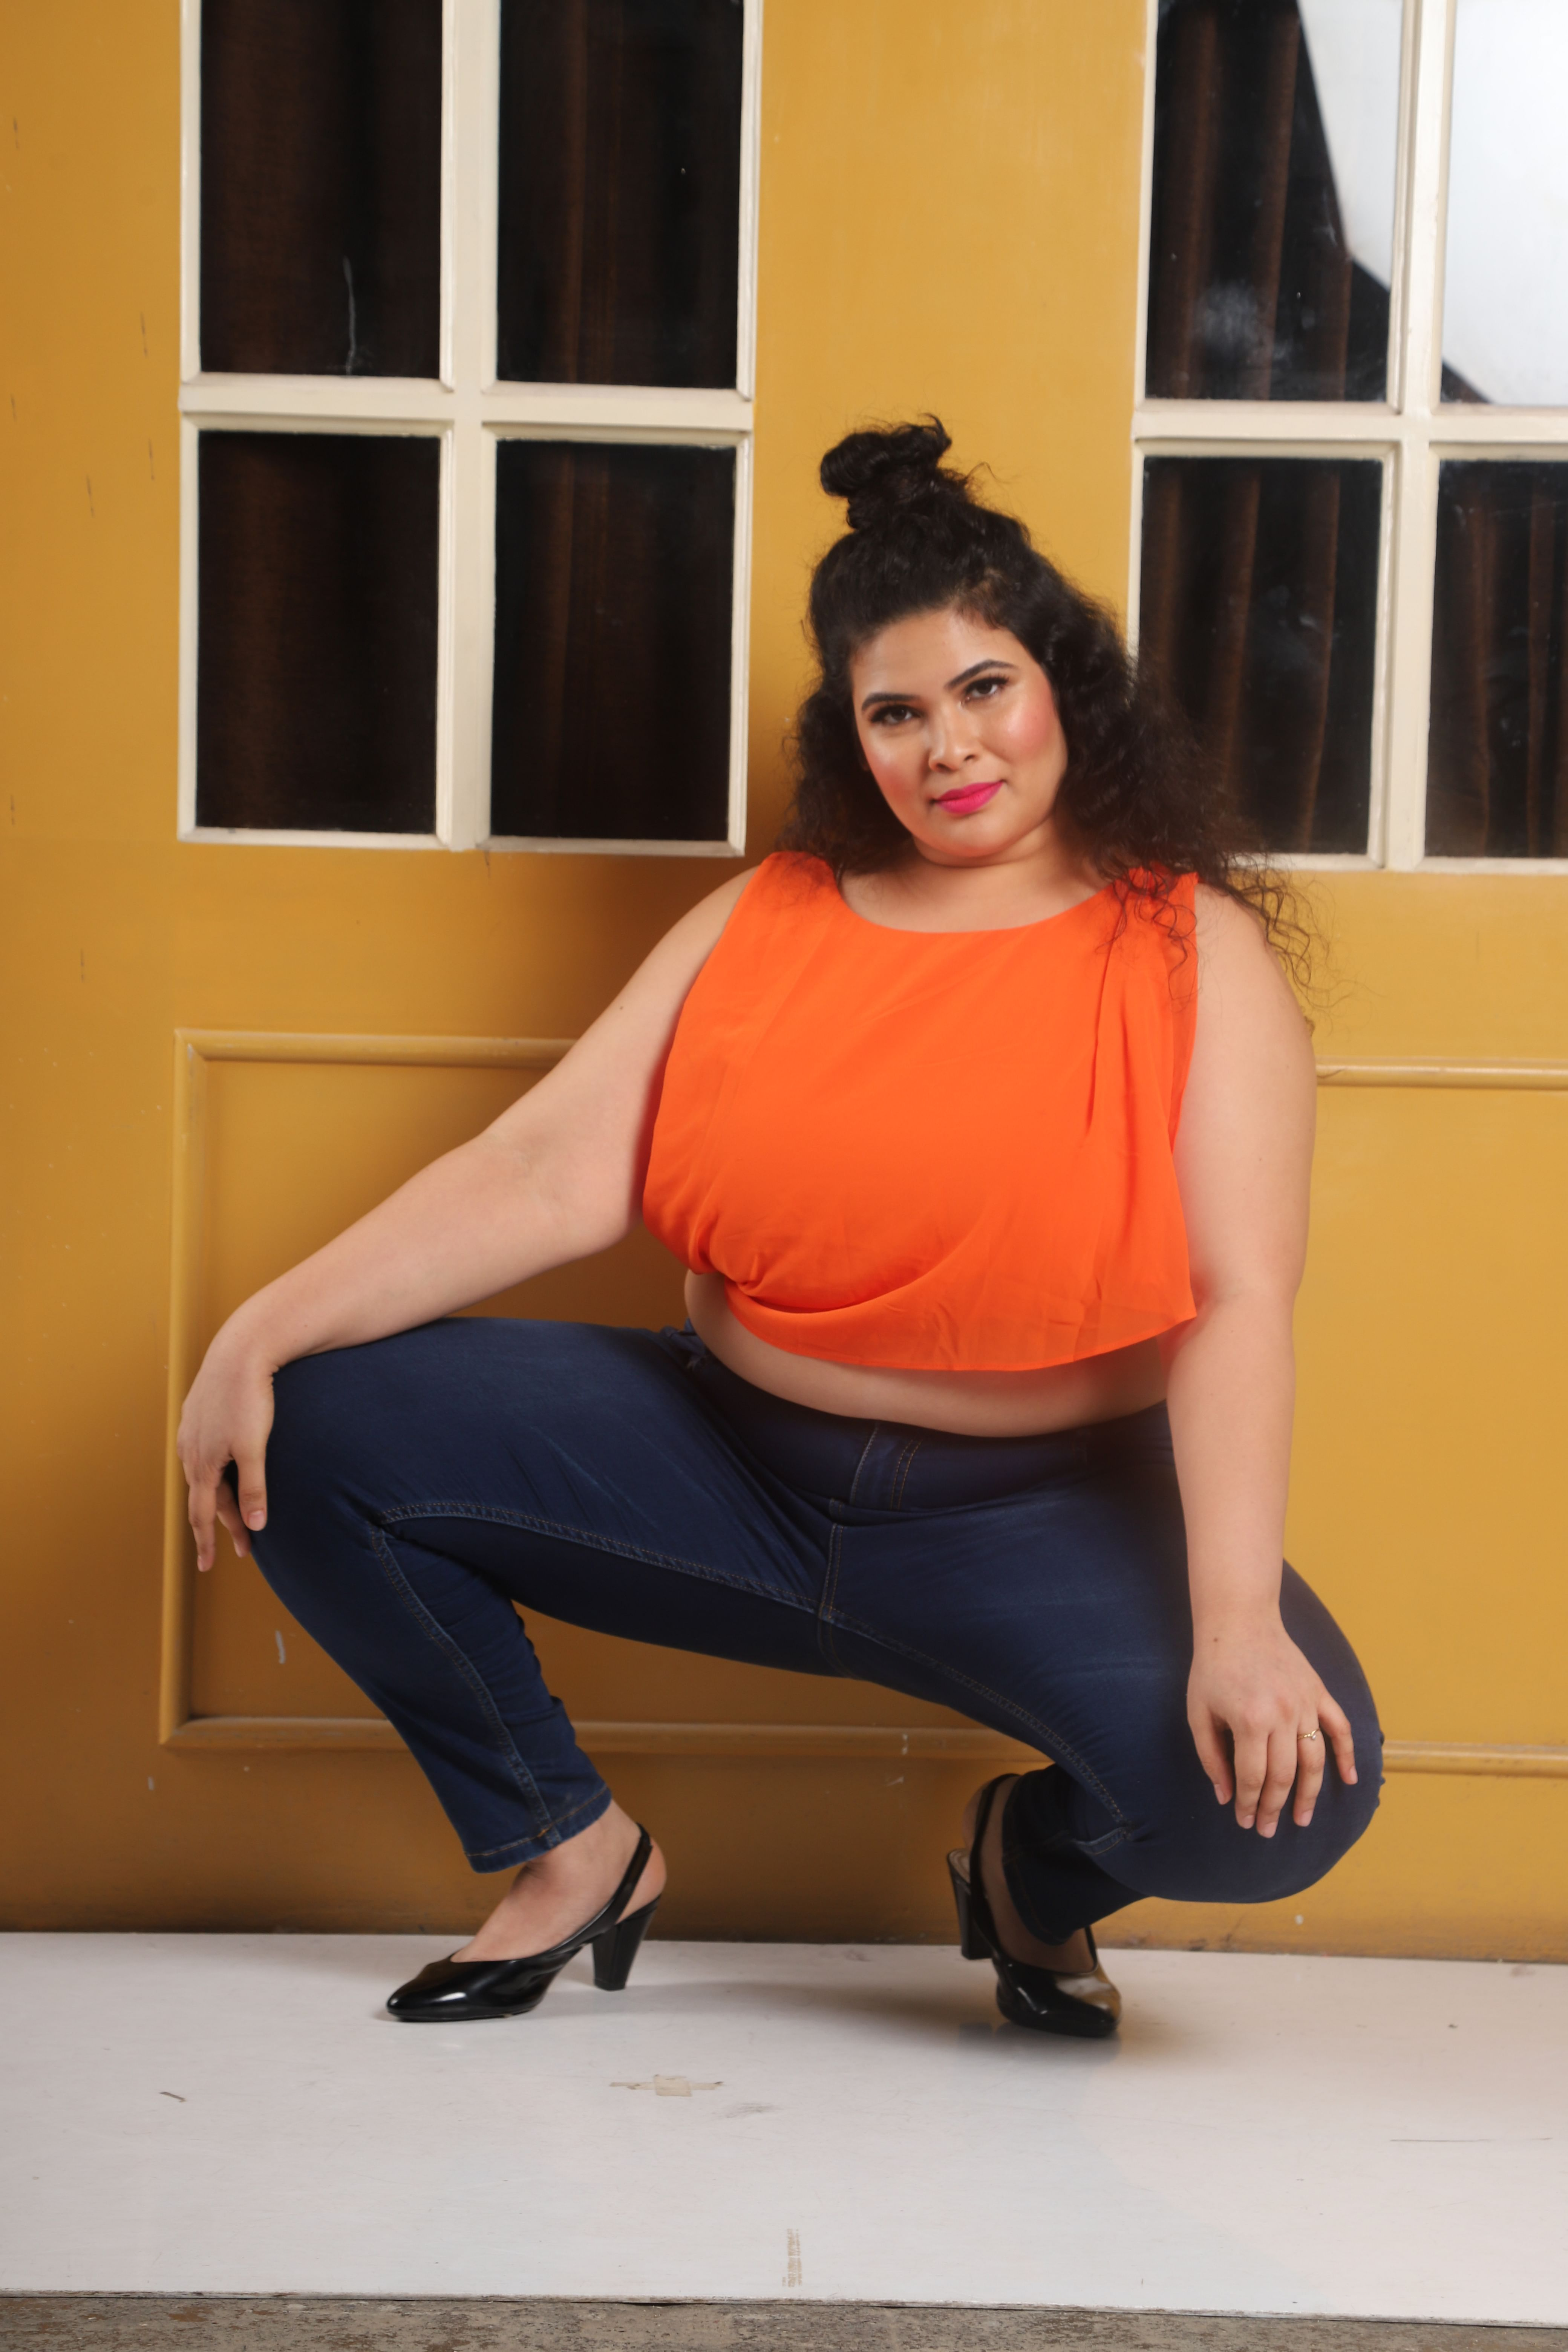 mumbai-anjana-bapat-plus-size-model-bodyshaming-india